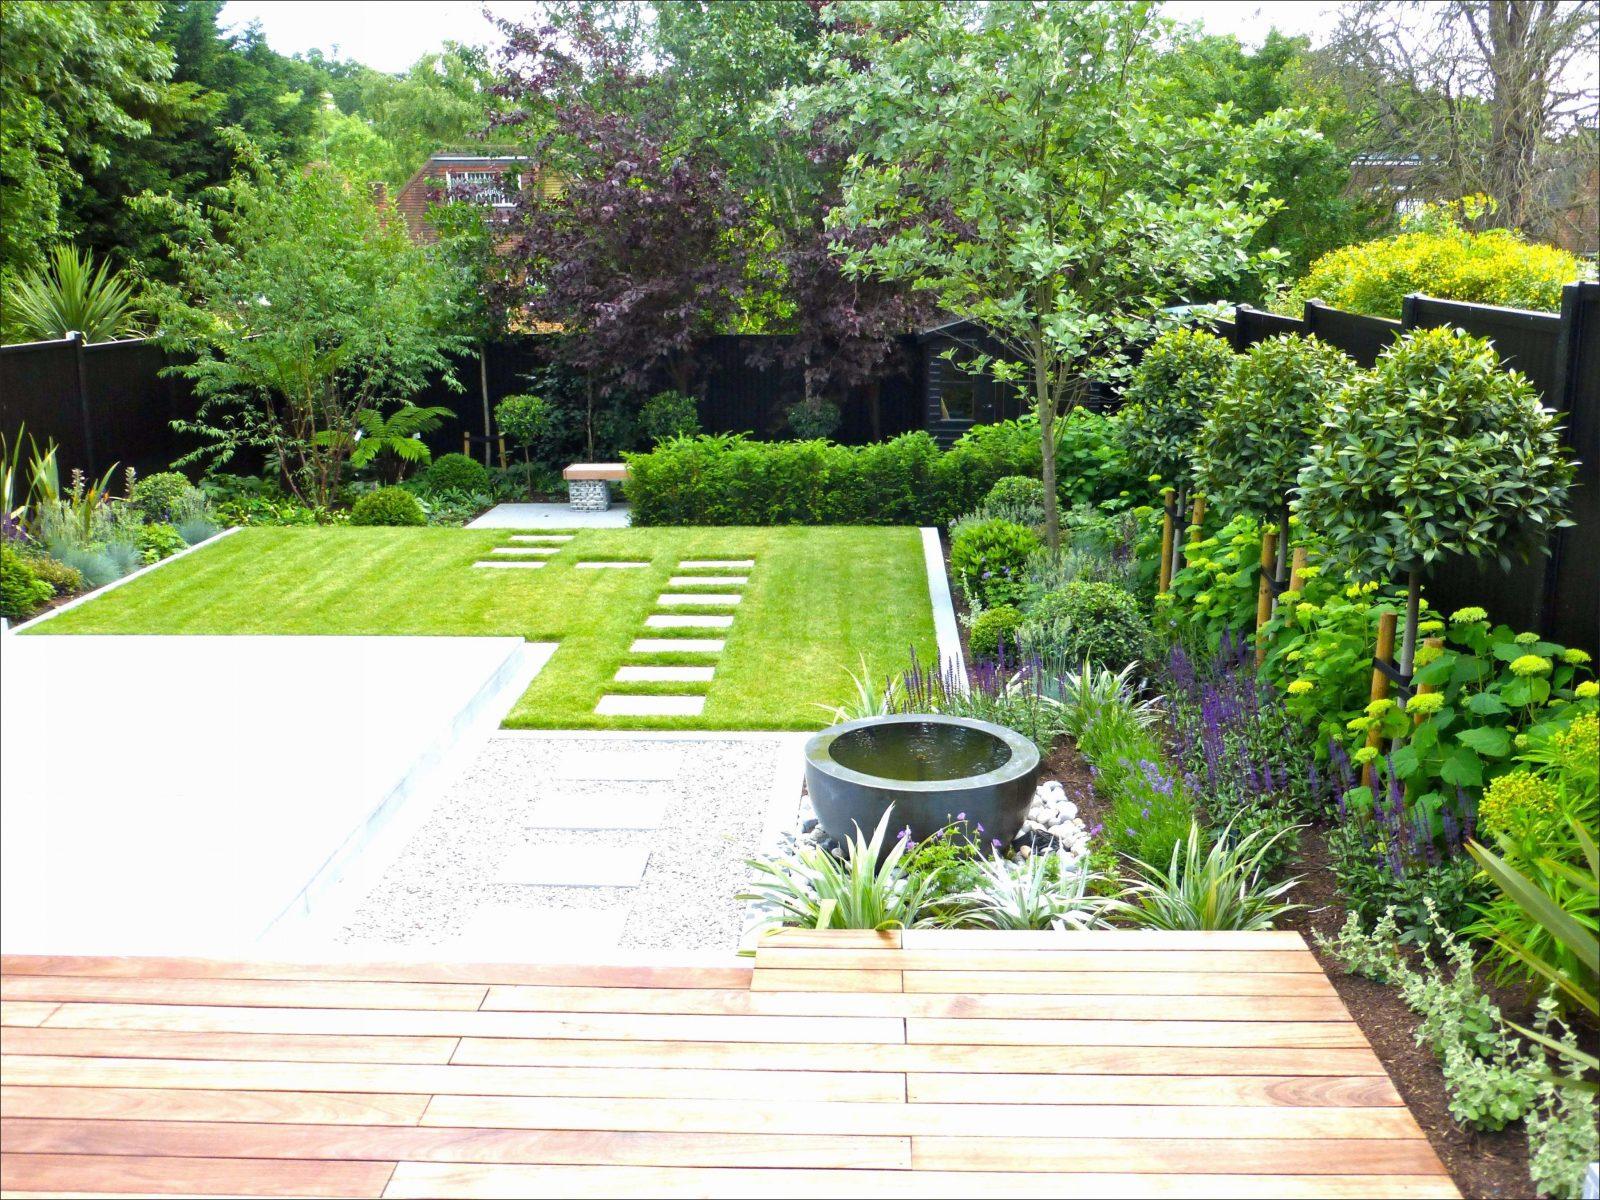 Brunnen Garten Selber Bauen Luxus Garten Brunnen Gartenbrunnen von Brunnen Bauen Im Garten Photo